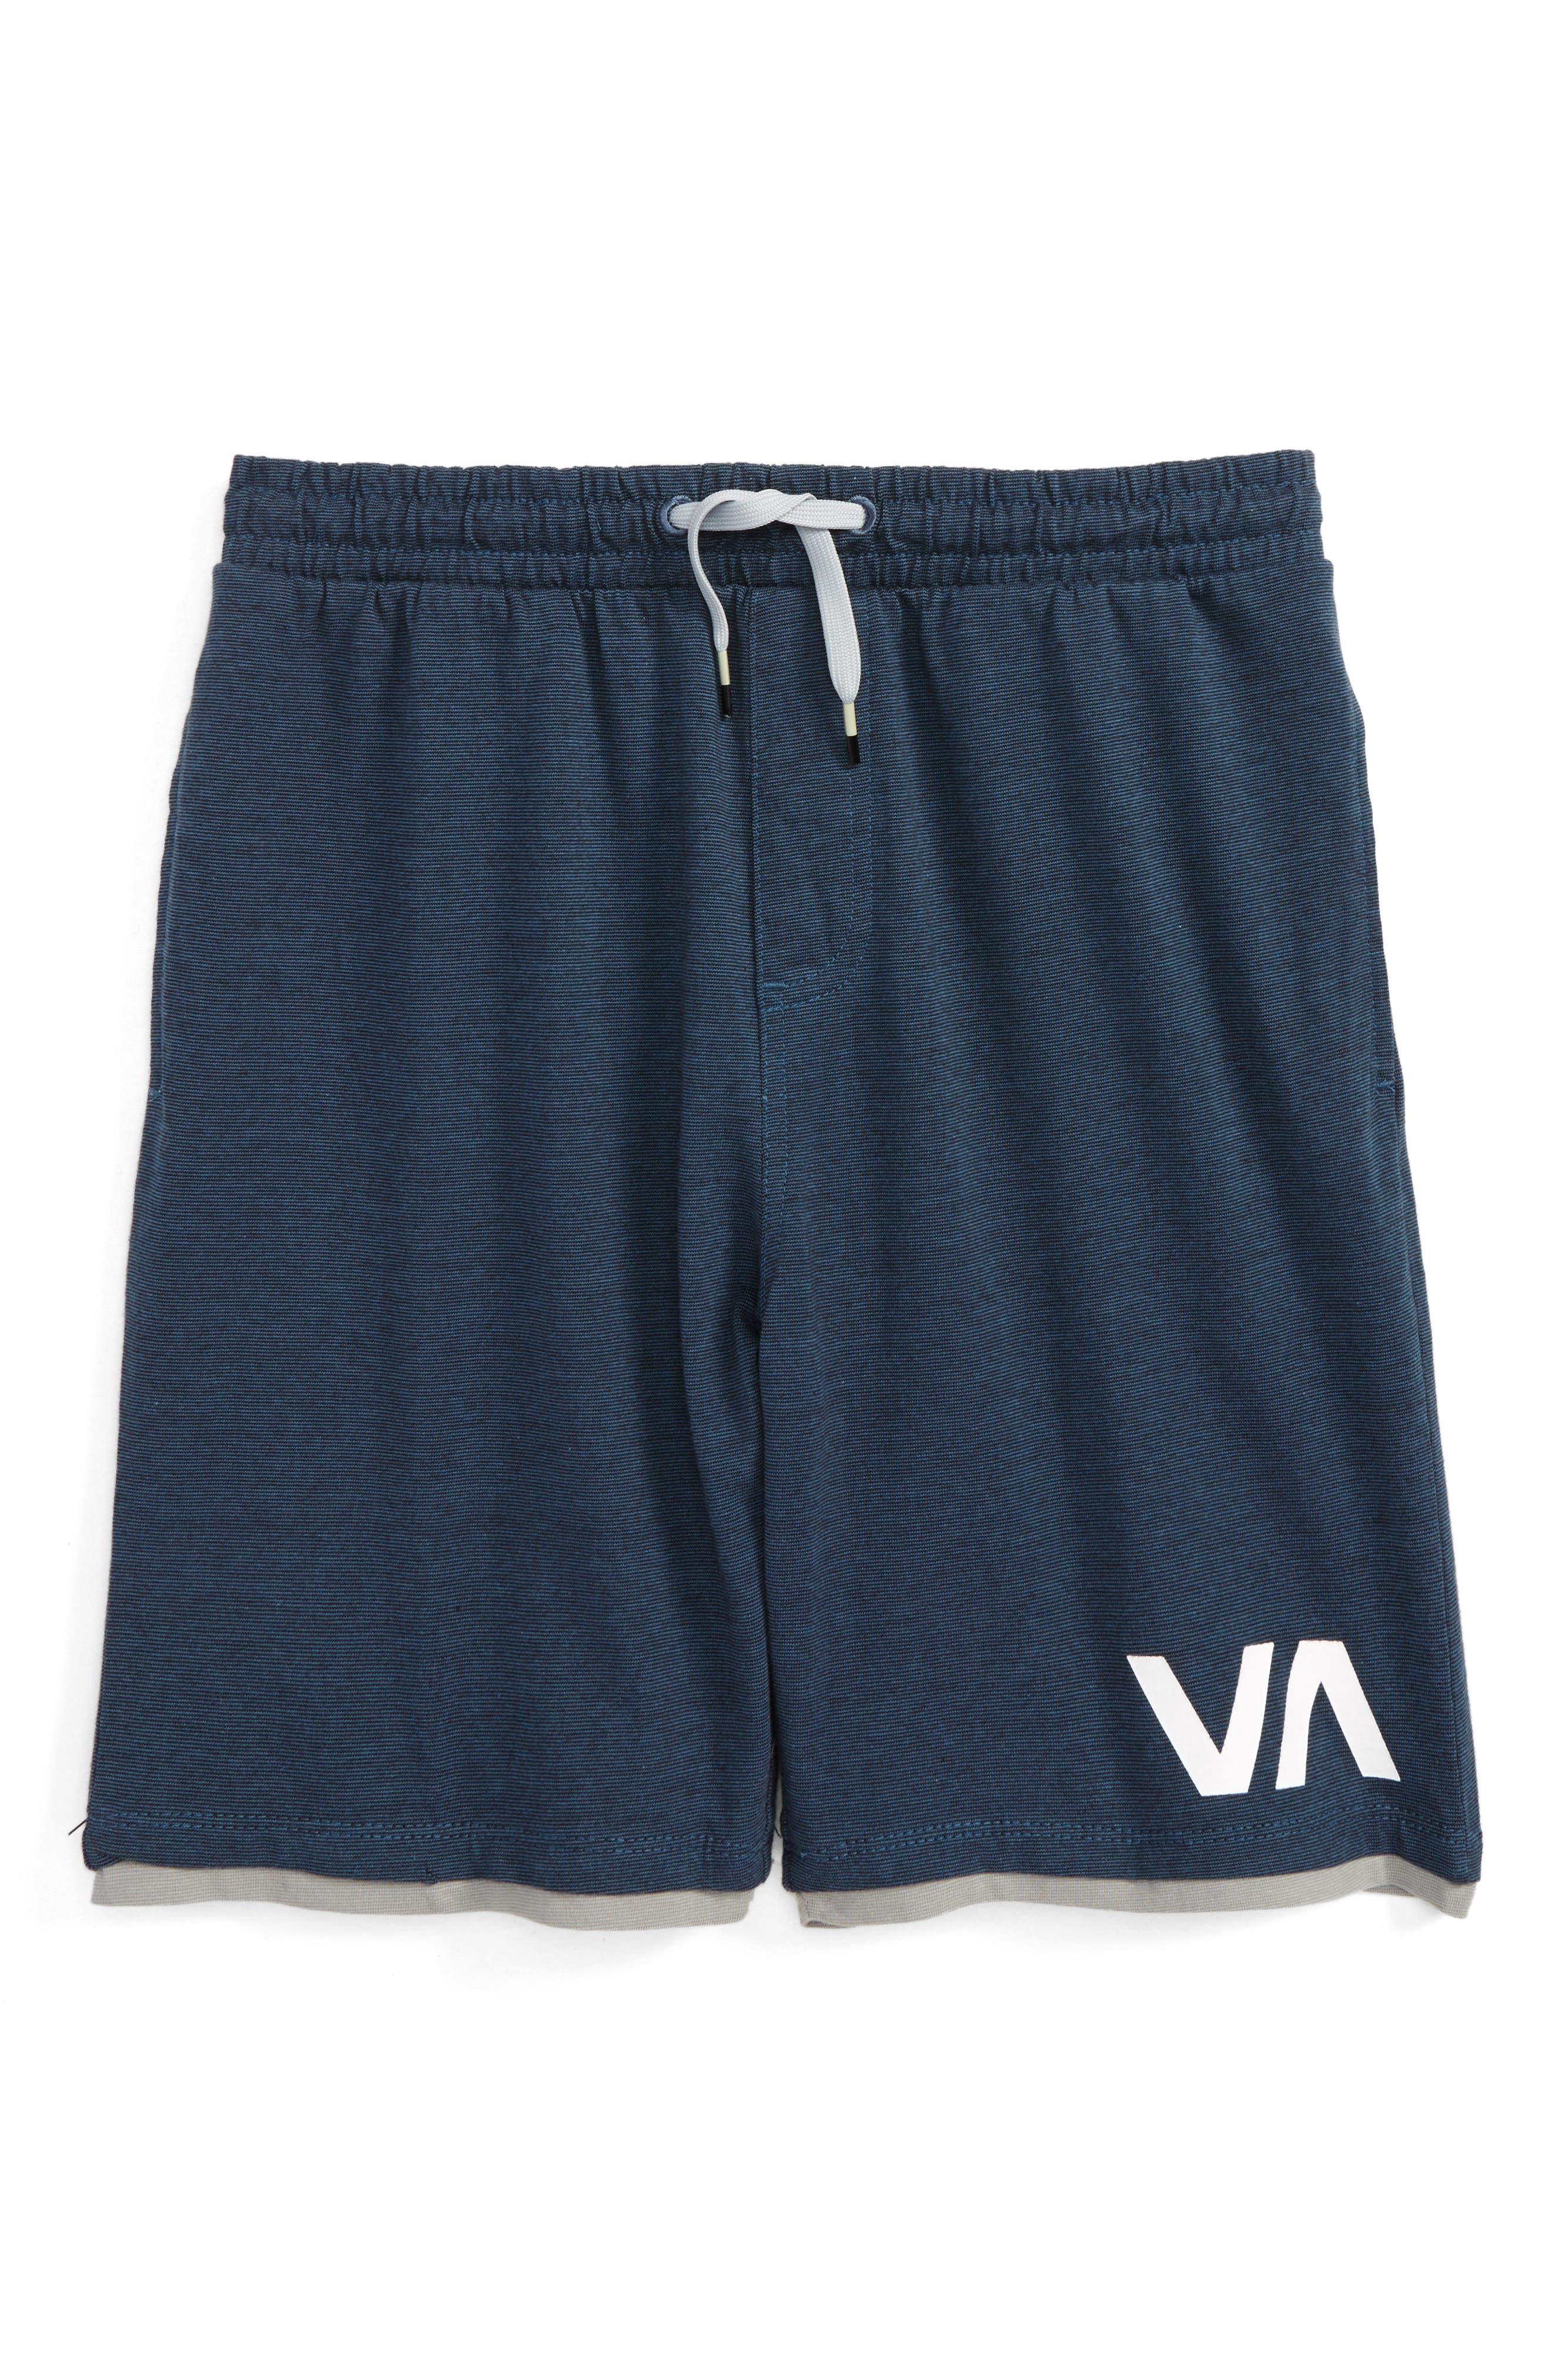 Main Image - RVCA Layers II Shorts (Big Boys)